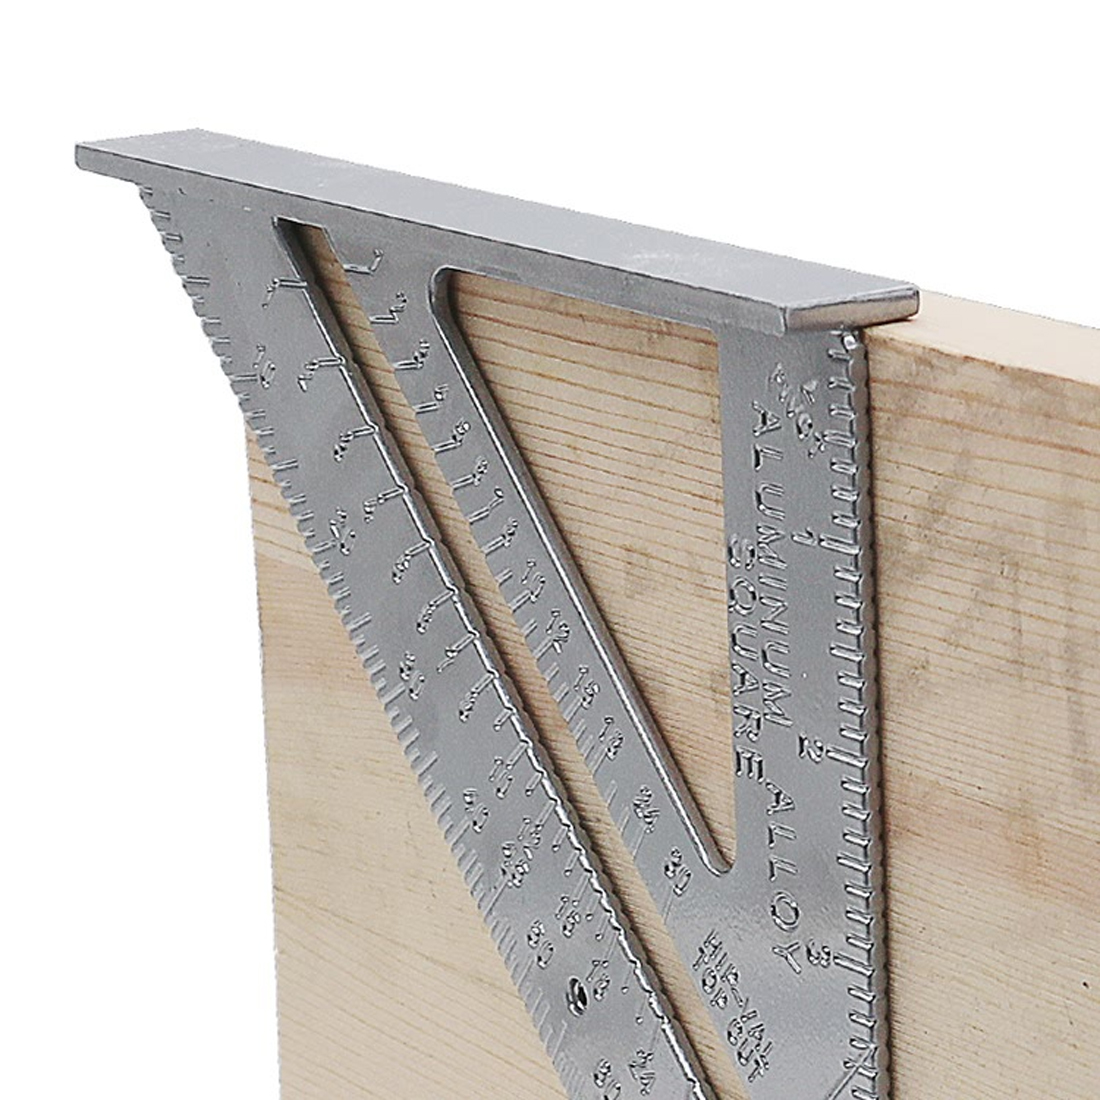 Measurement Inch Carpenter Ruler Speed Square Protractor Aluminum Alloy Miter Framing Tri-square Line Scriber Saw Guide